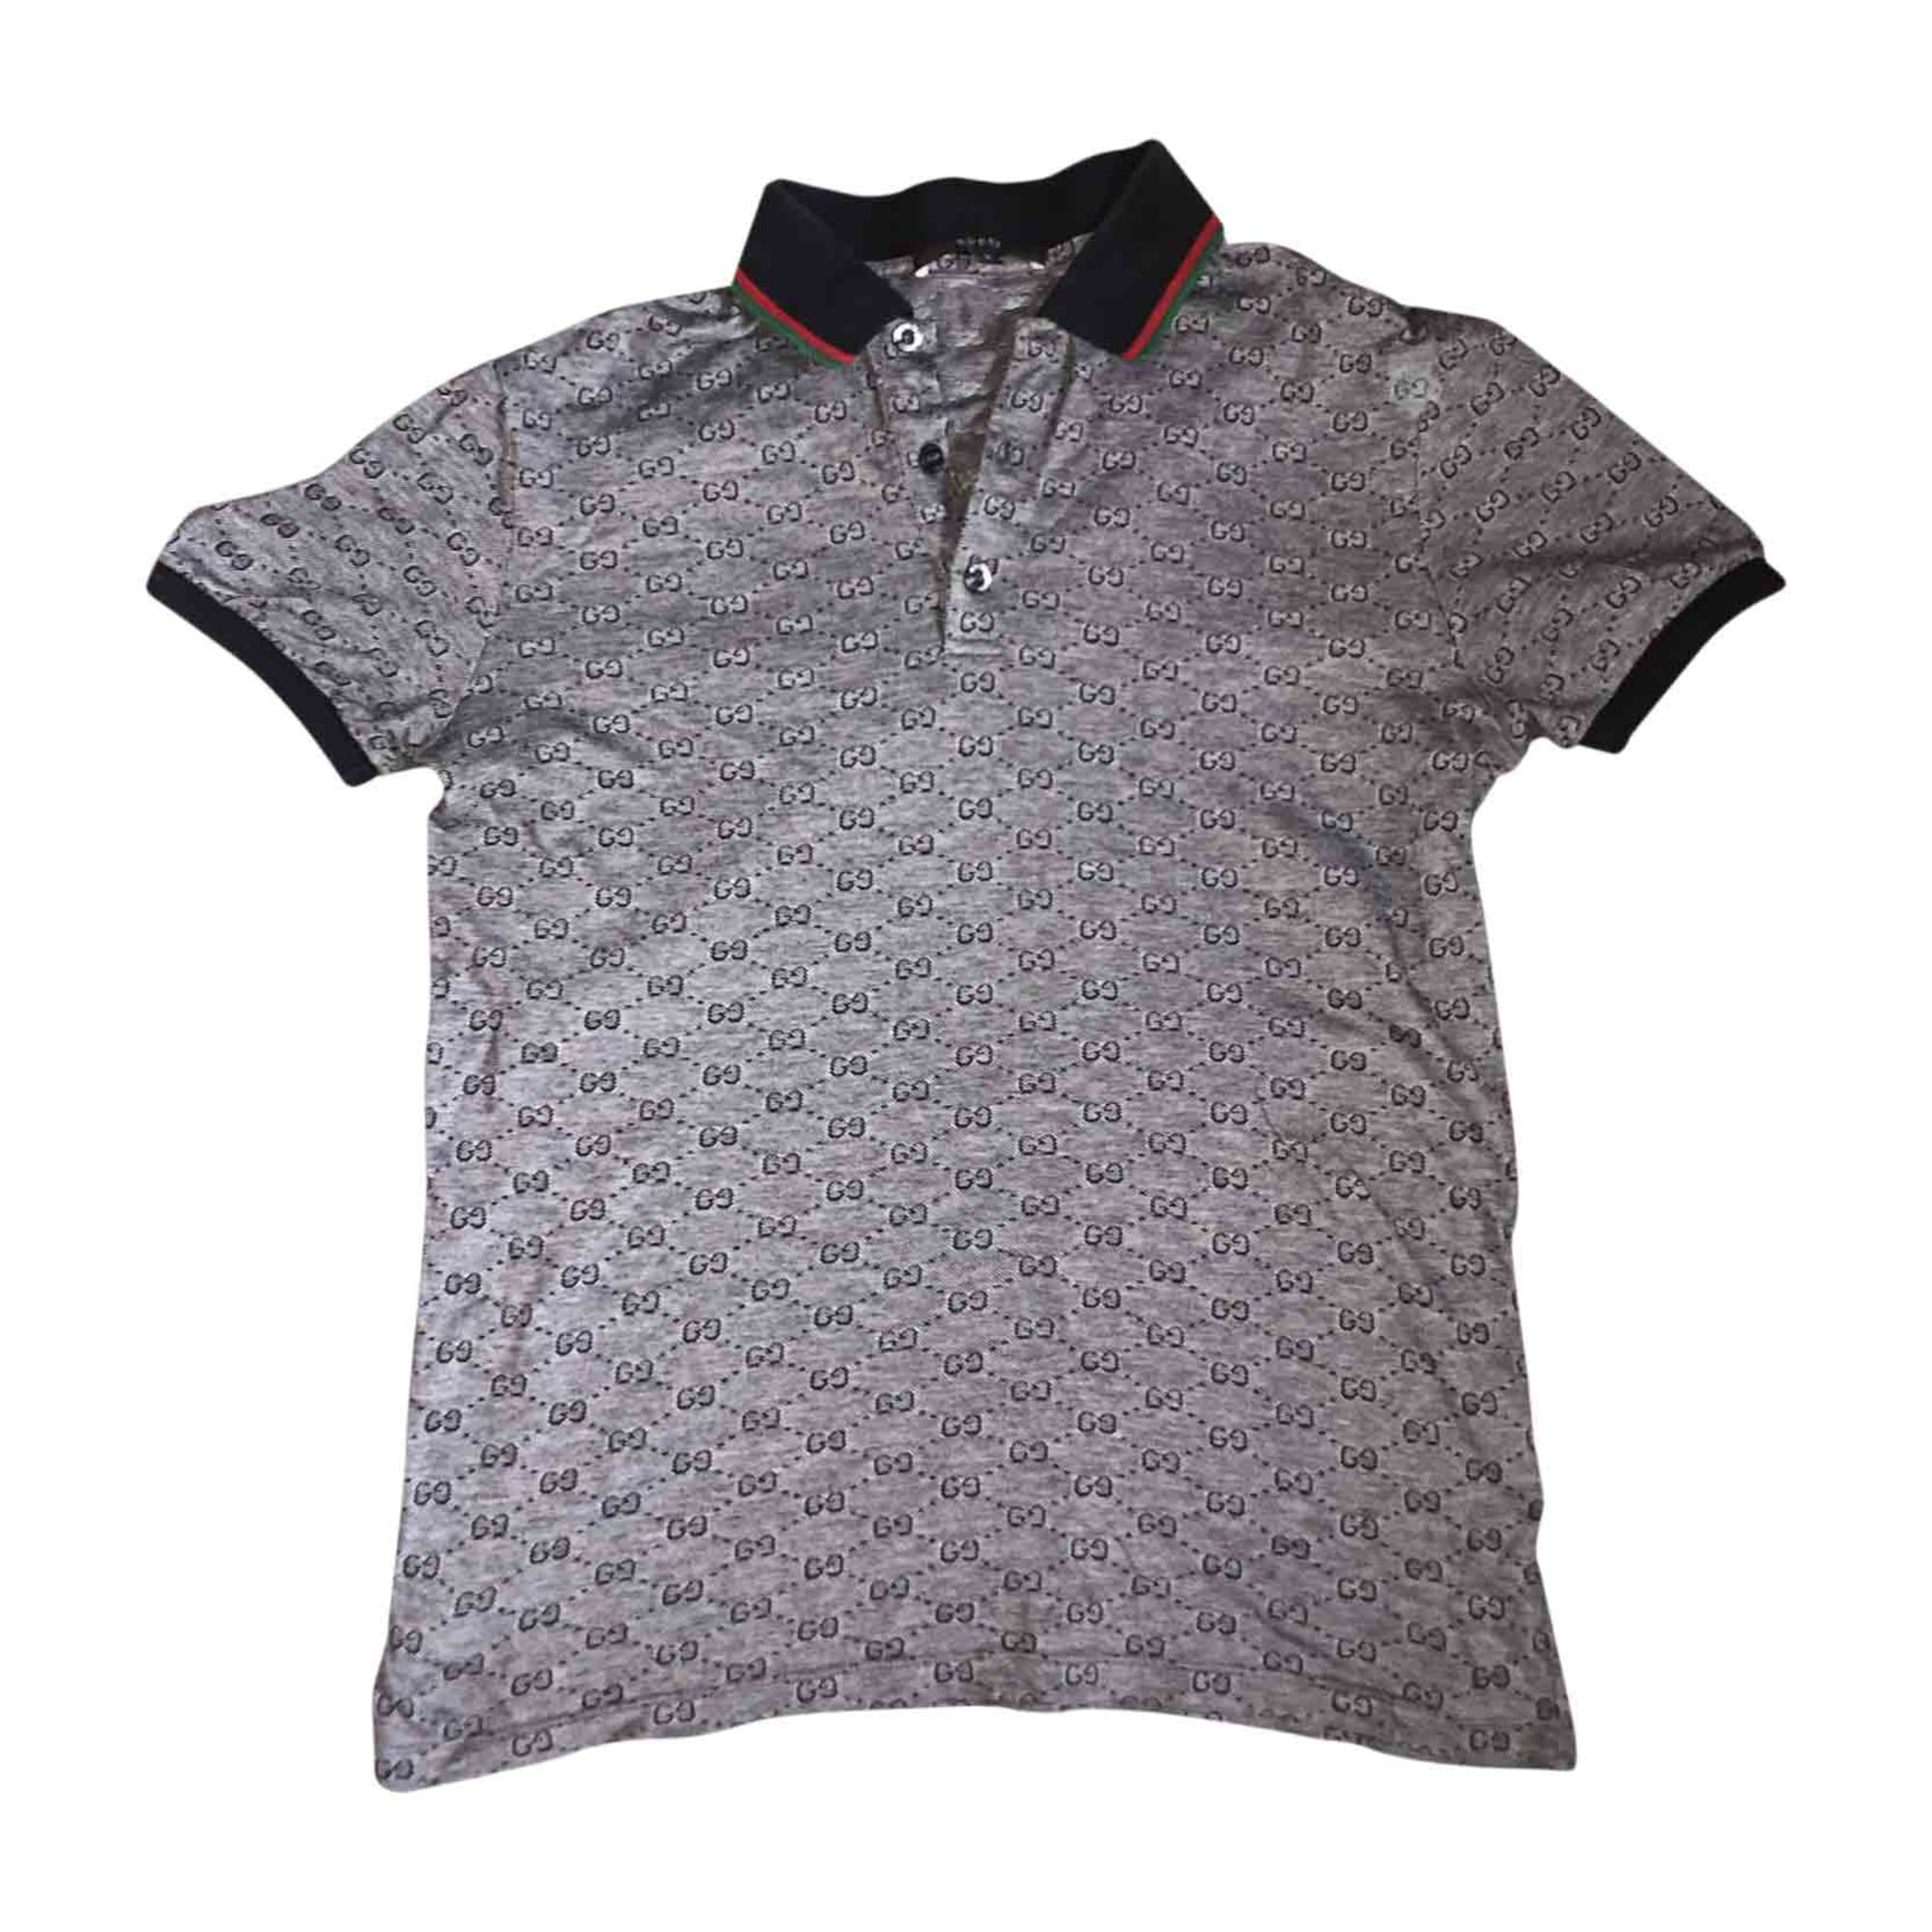 Polo GUCCI 1 (S) gray vendu par Sathya 5 - 7067752 9e8d1ad68cb